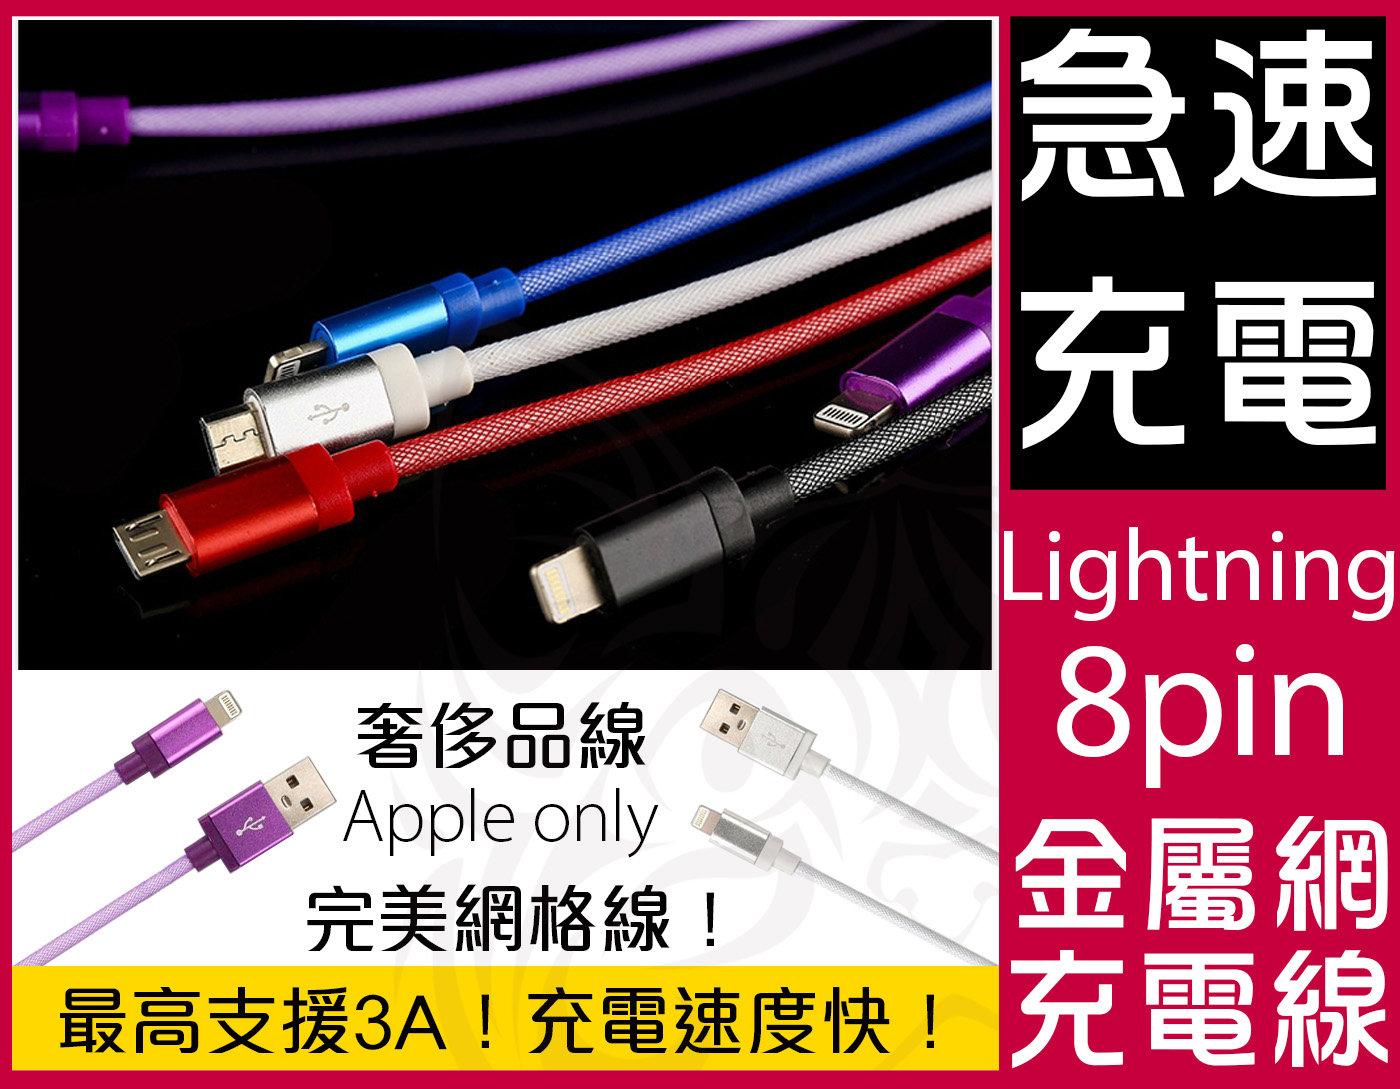 iPhone 6S Plus 可用 奢侈品線 充電 傳輸 線【D-I5-014】可支援3A 類原廠品質 編織線 隨機出貨